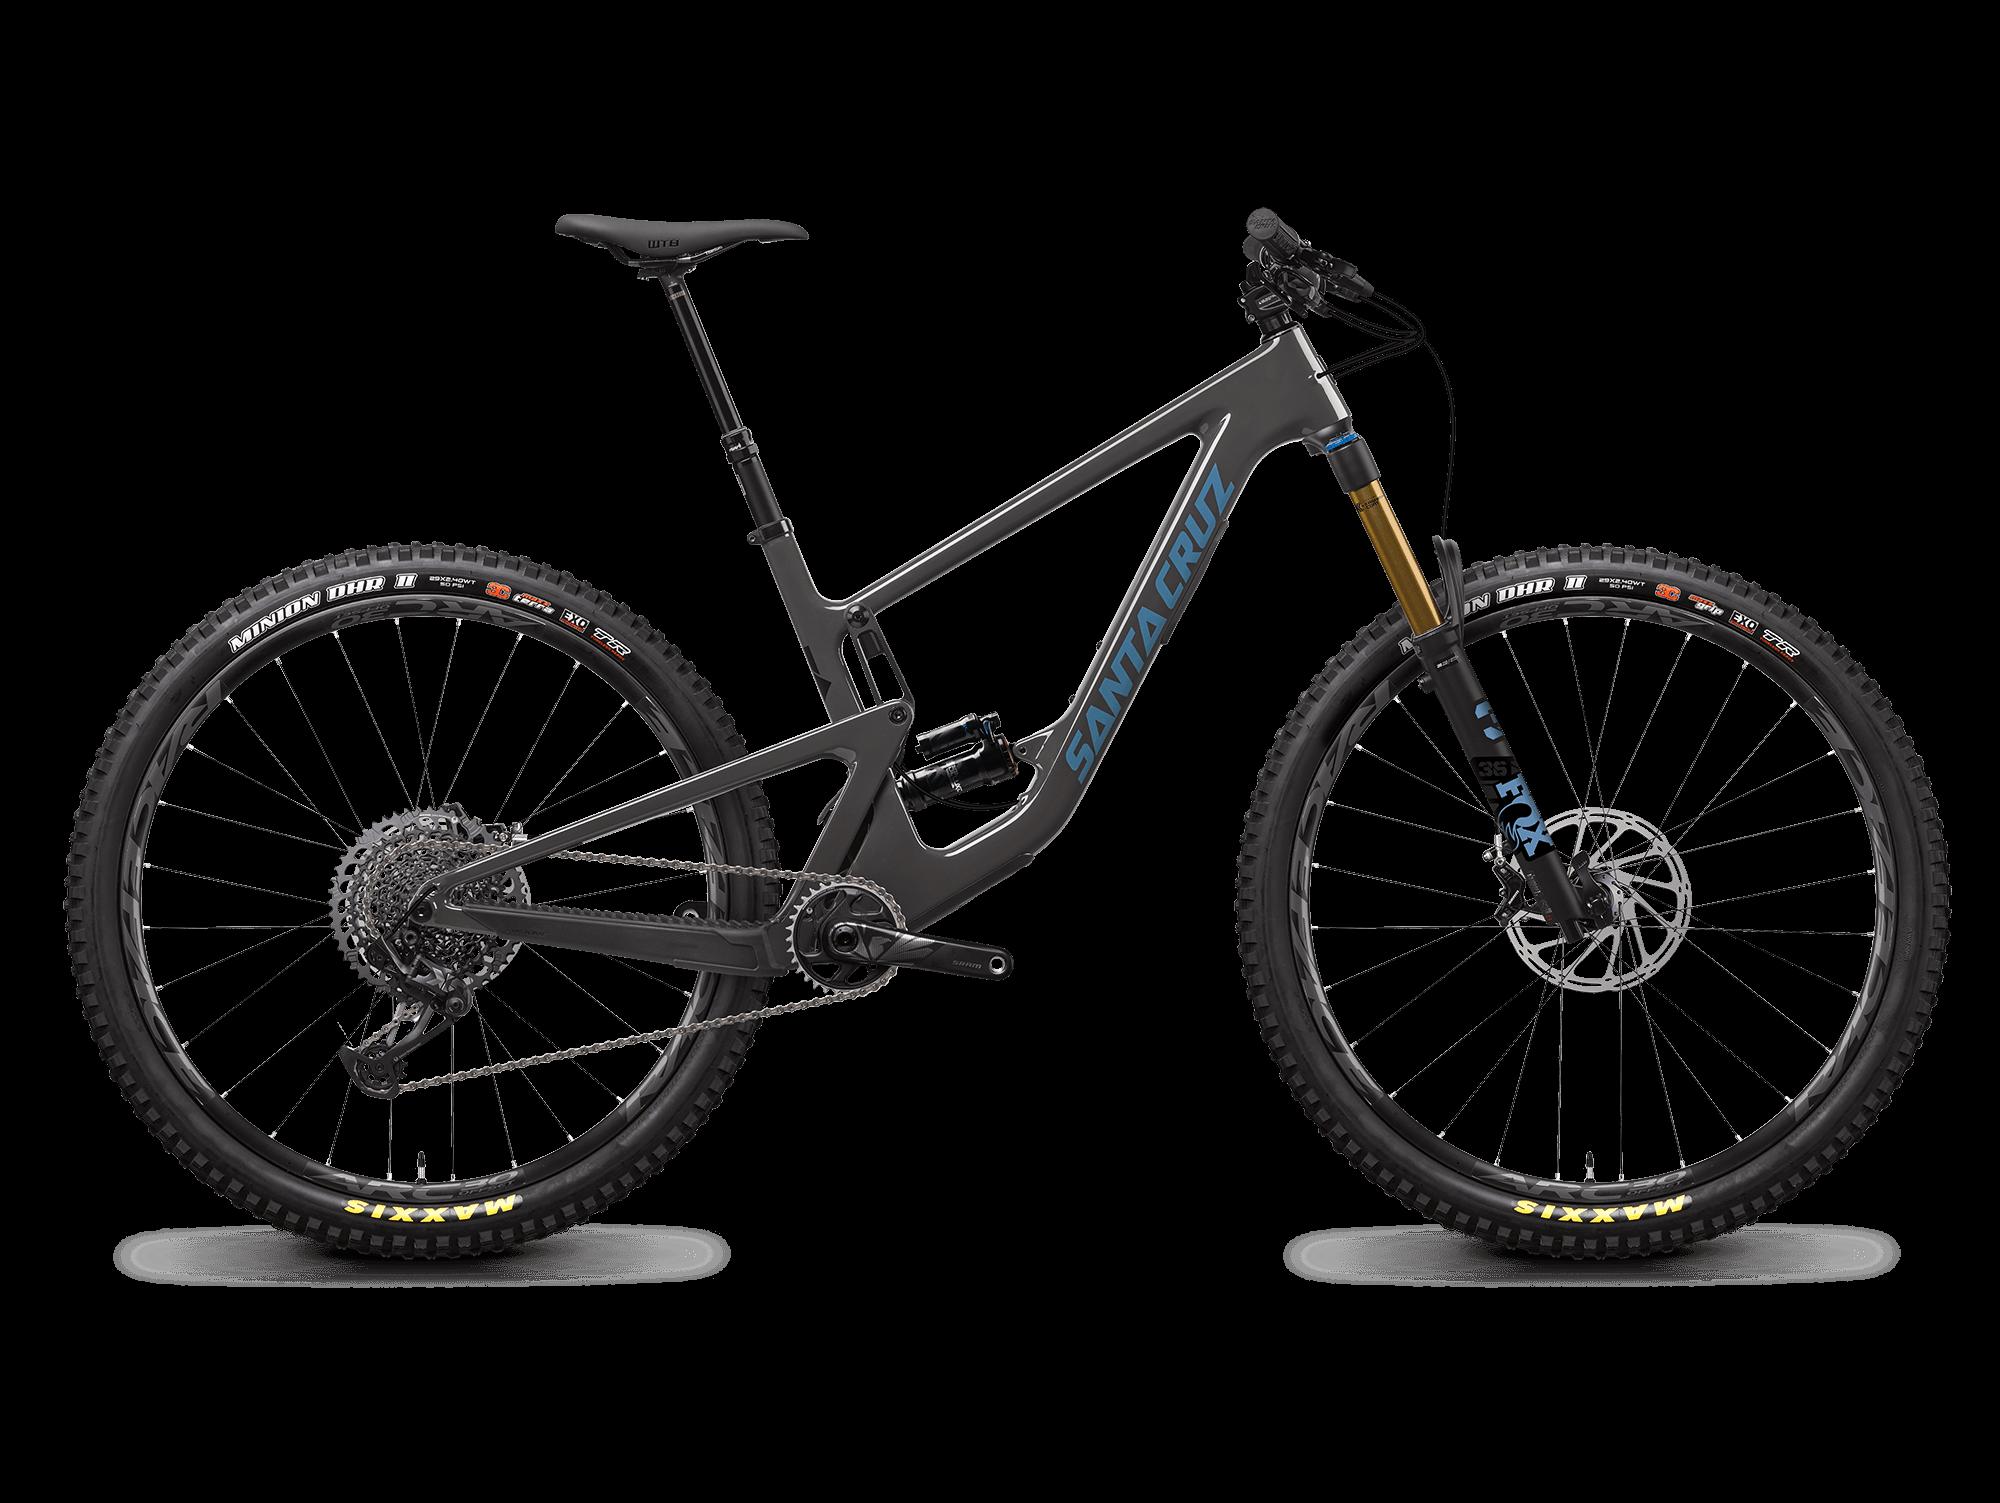 Santa Cruz Hightower V2 CC X01 Kit | Modell 2022